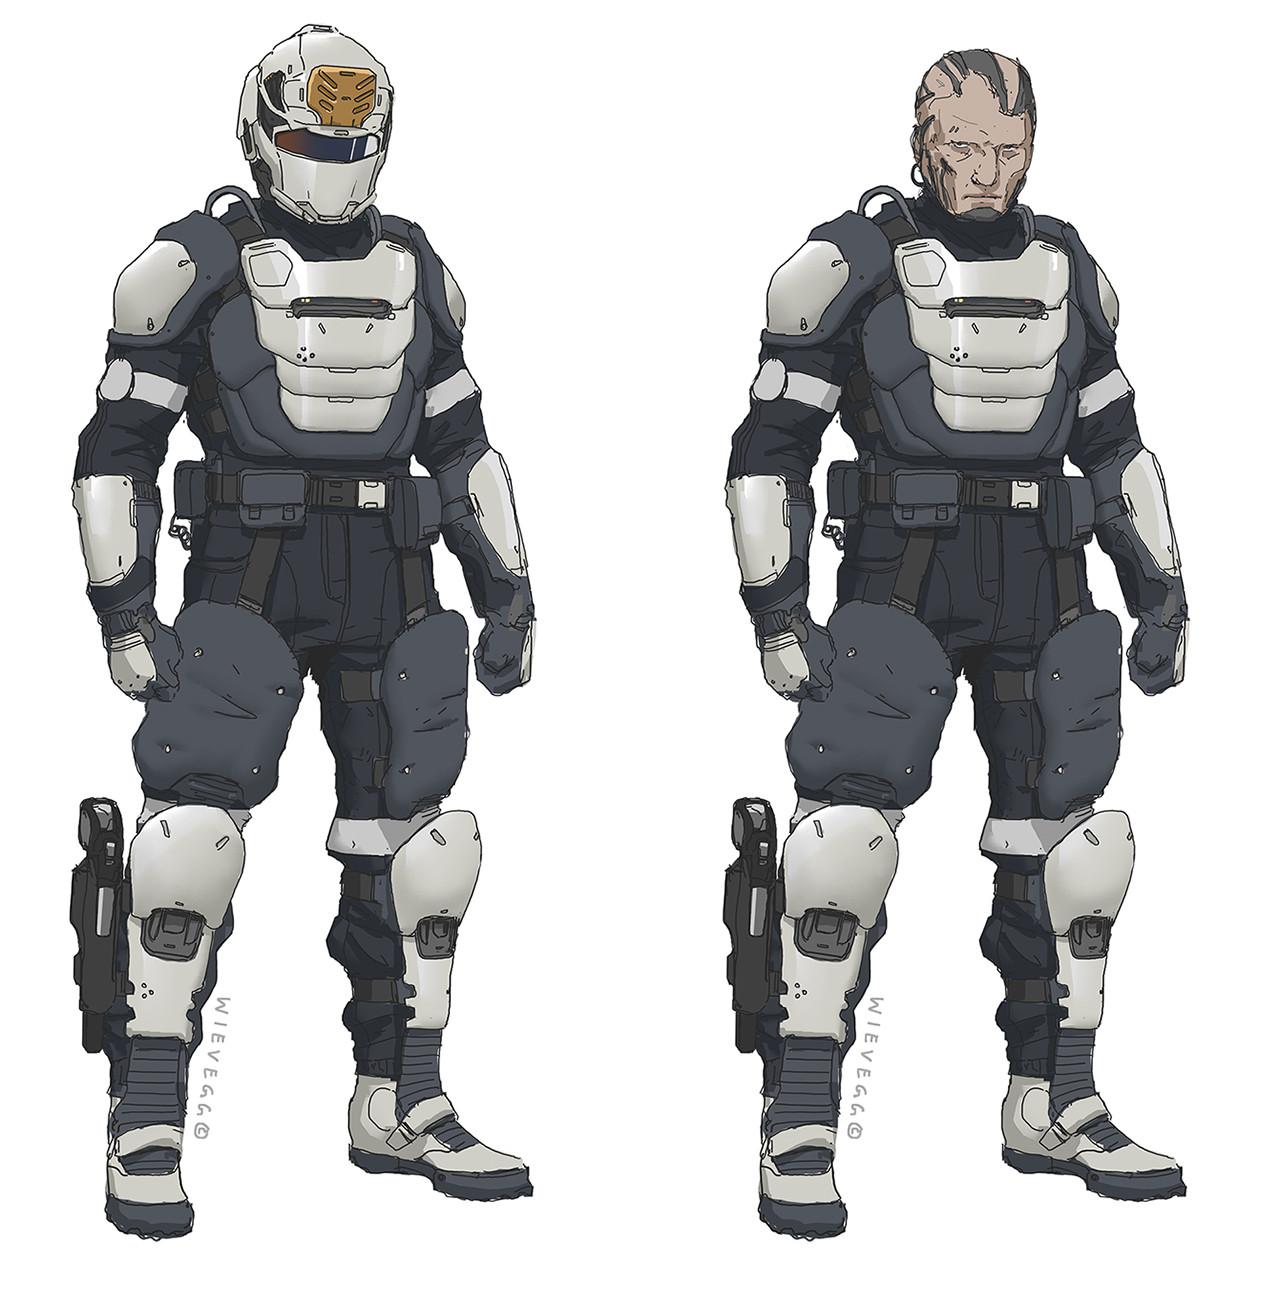 thomas-wievegg-scifi-cop-character.jpg?1